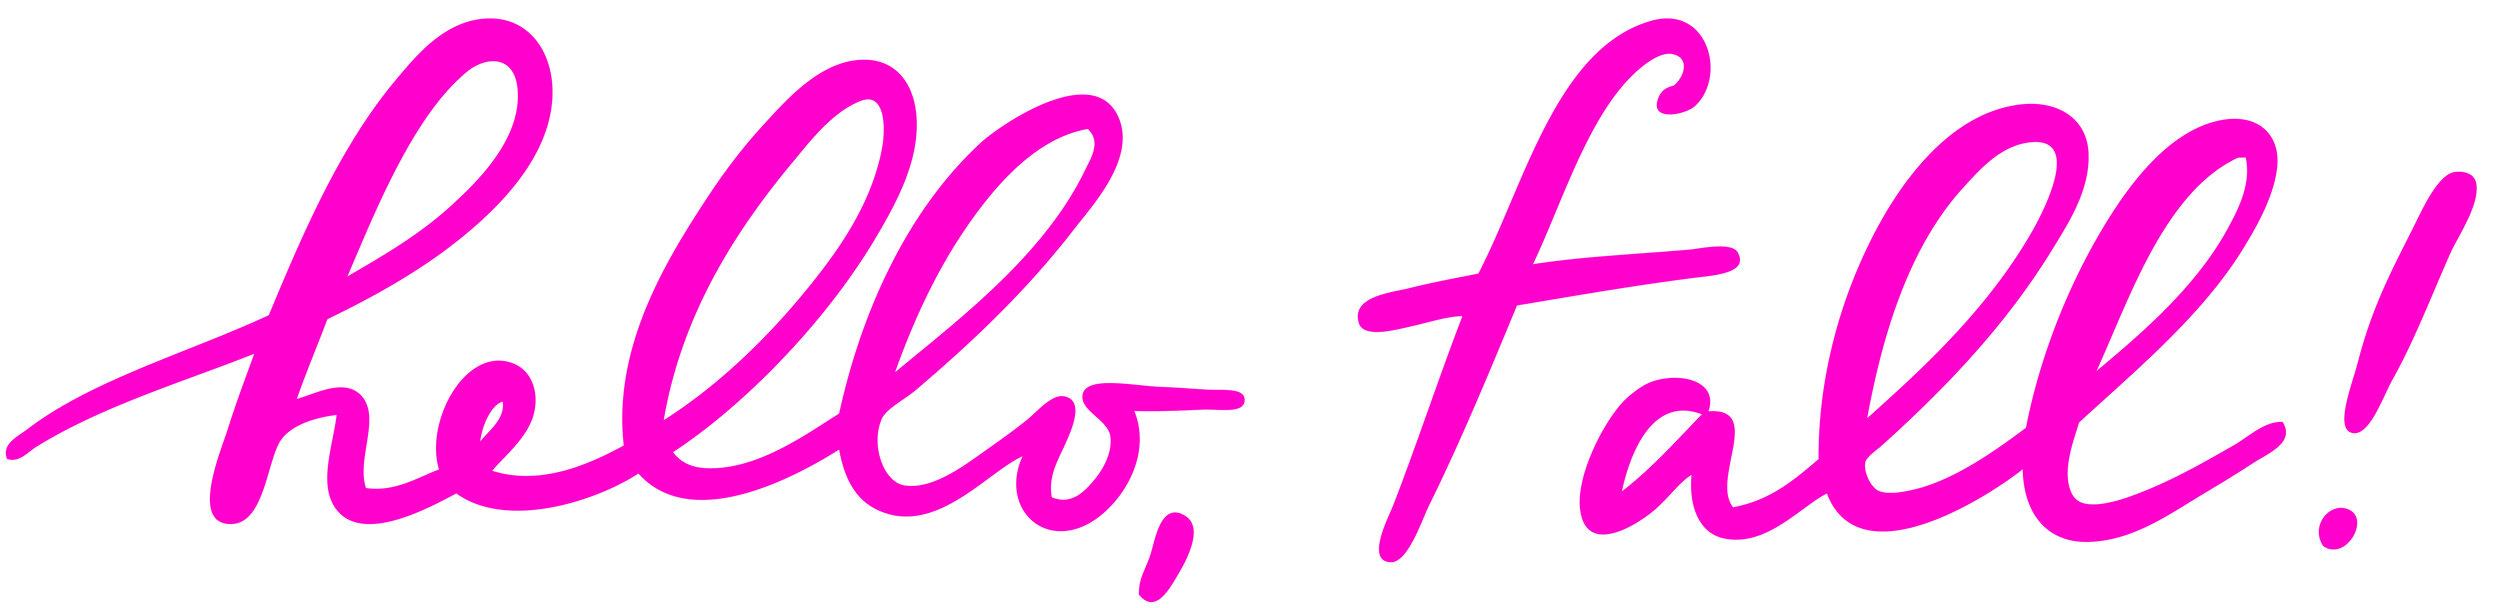 pink-01.jpg